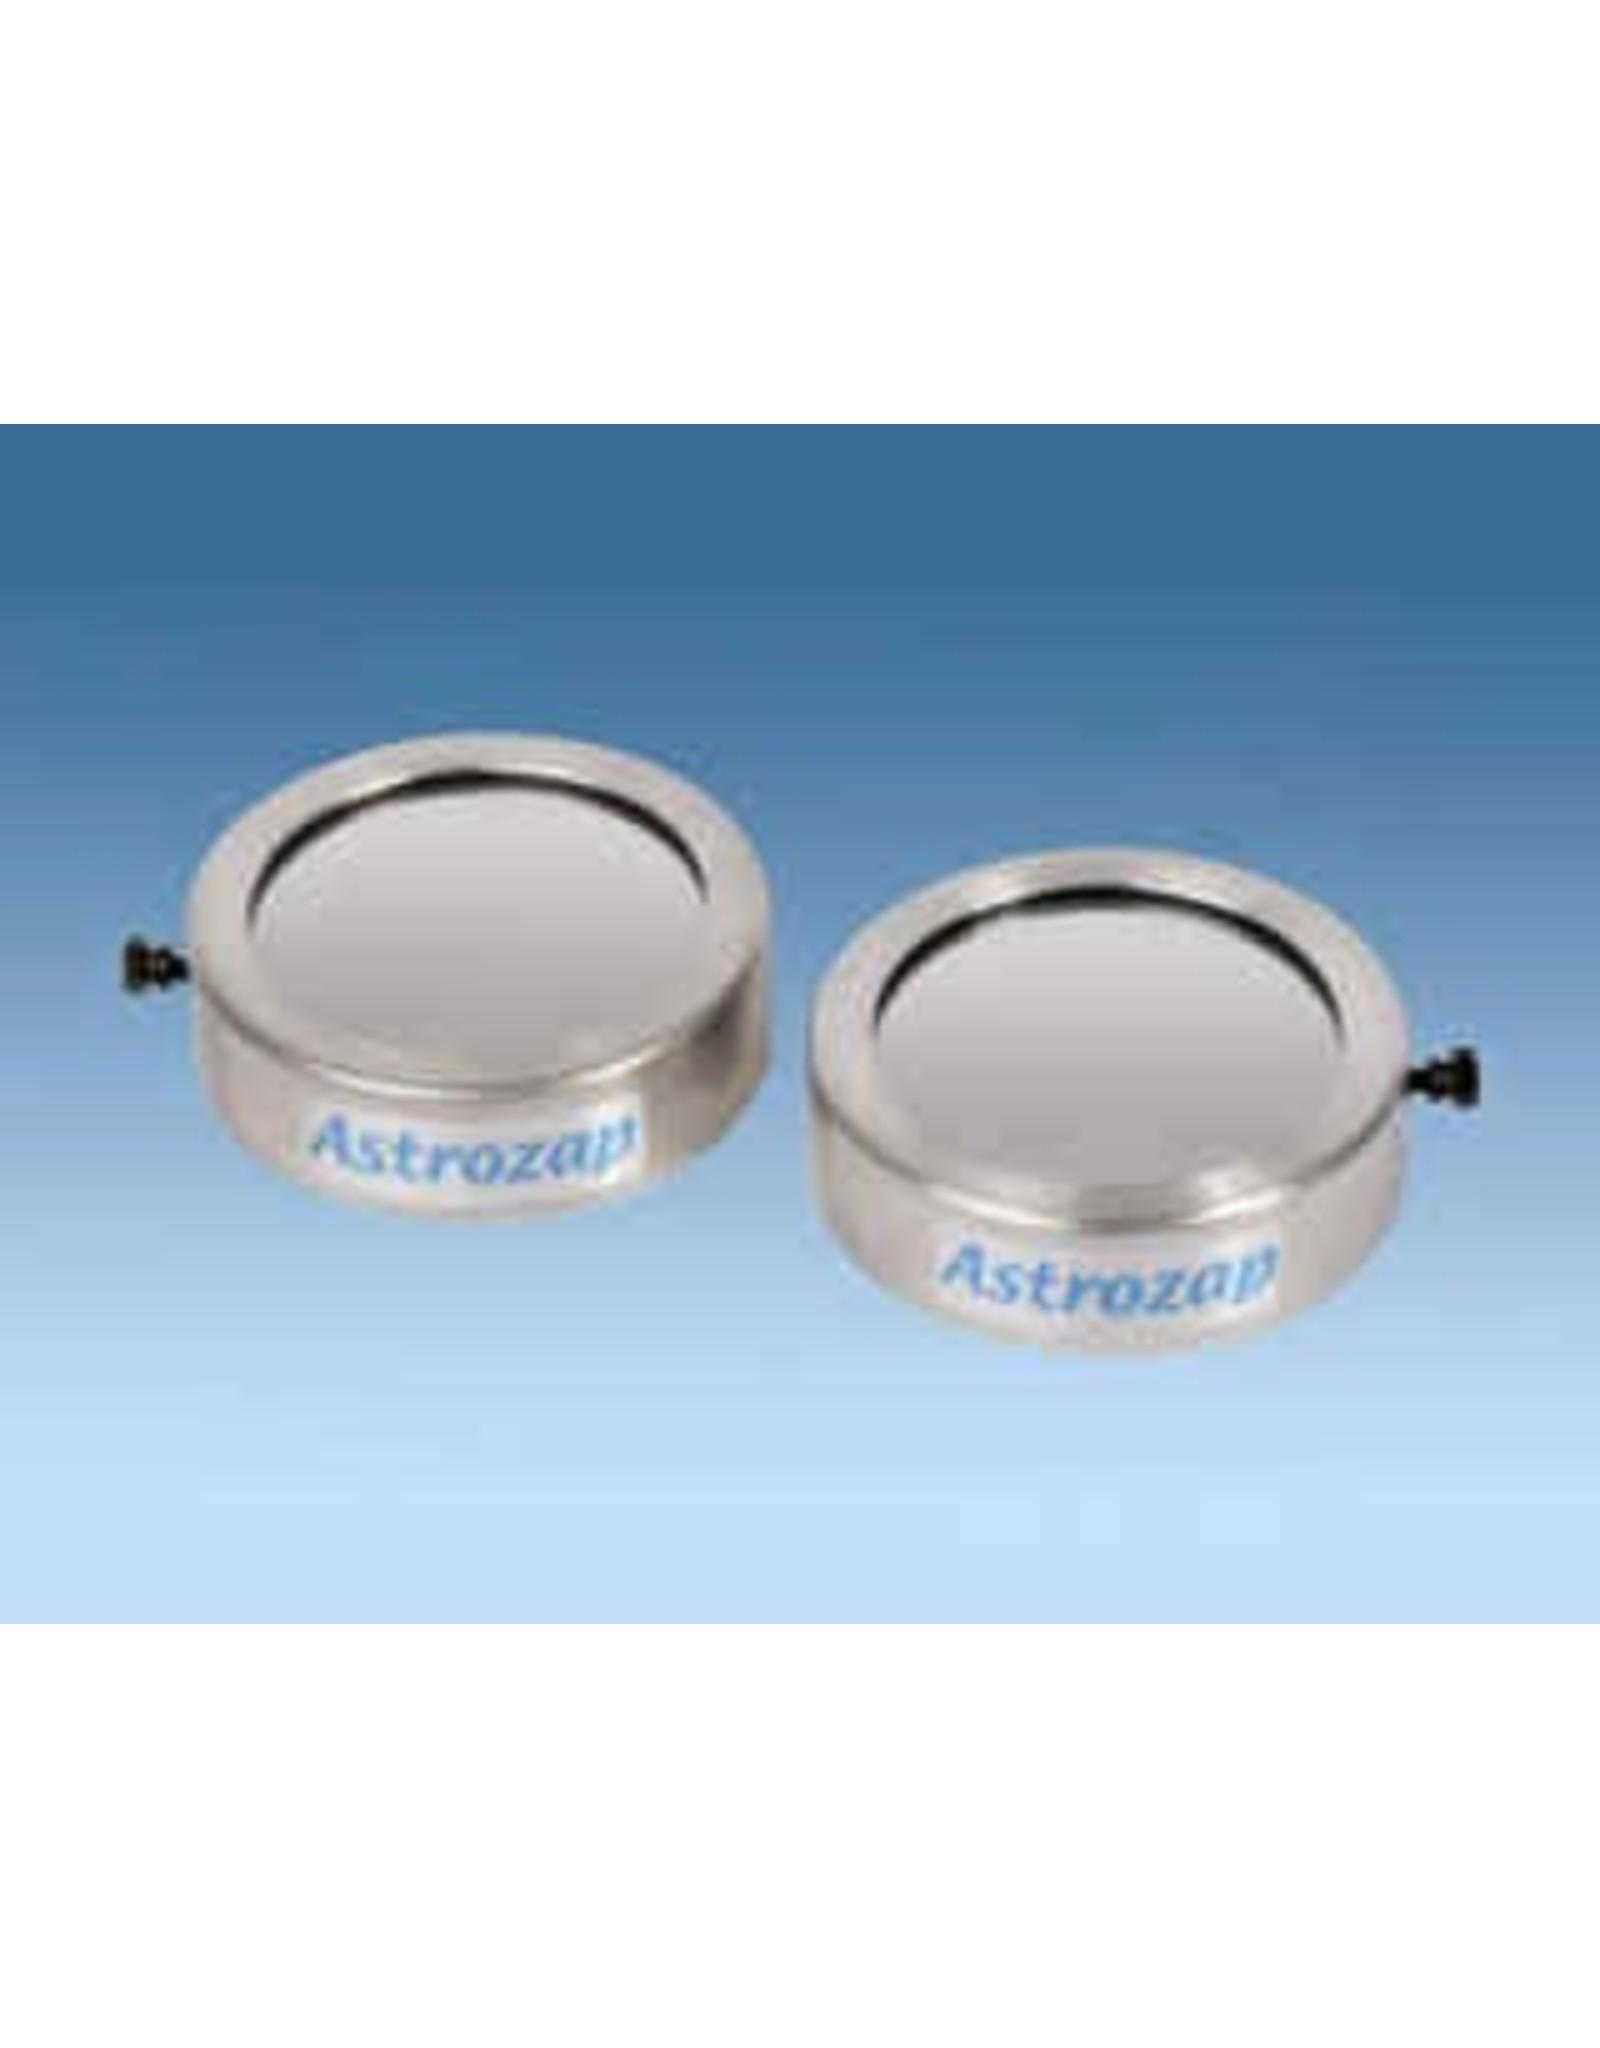 Astrozap AZ-1571 Glass Solar Filter - Binocular - 48mm-54mm